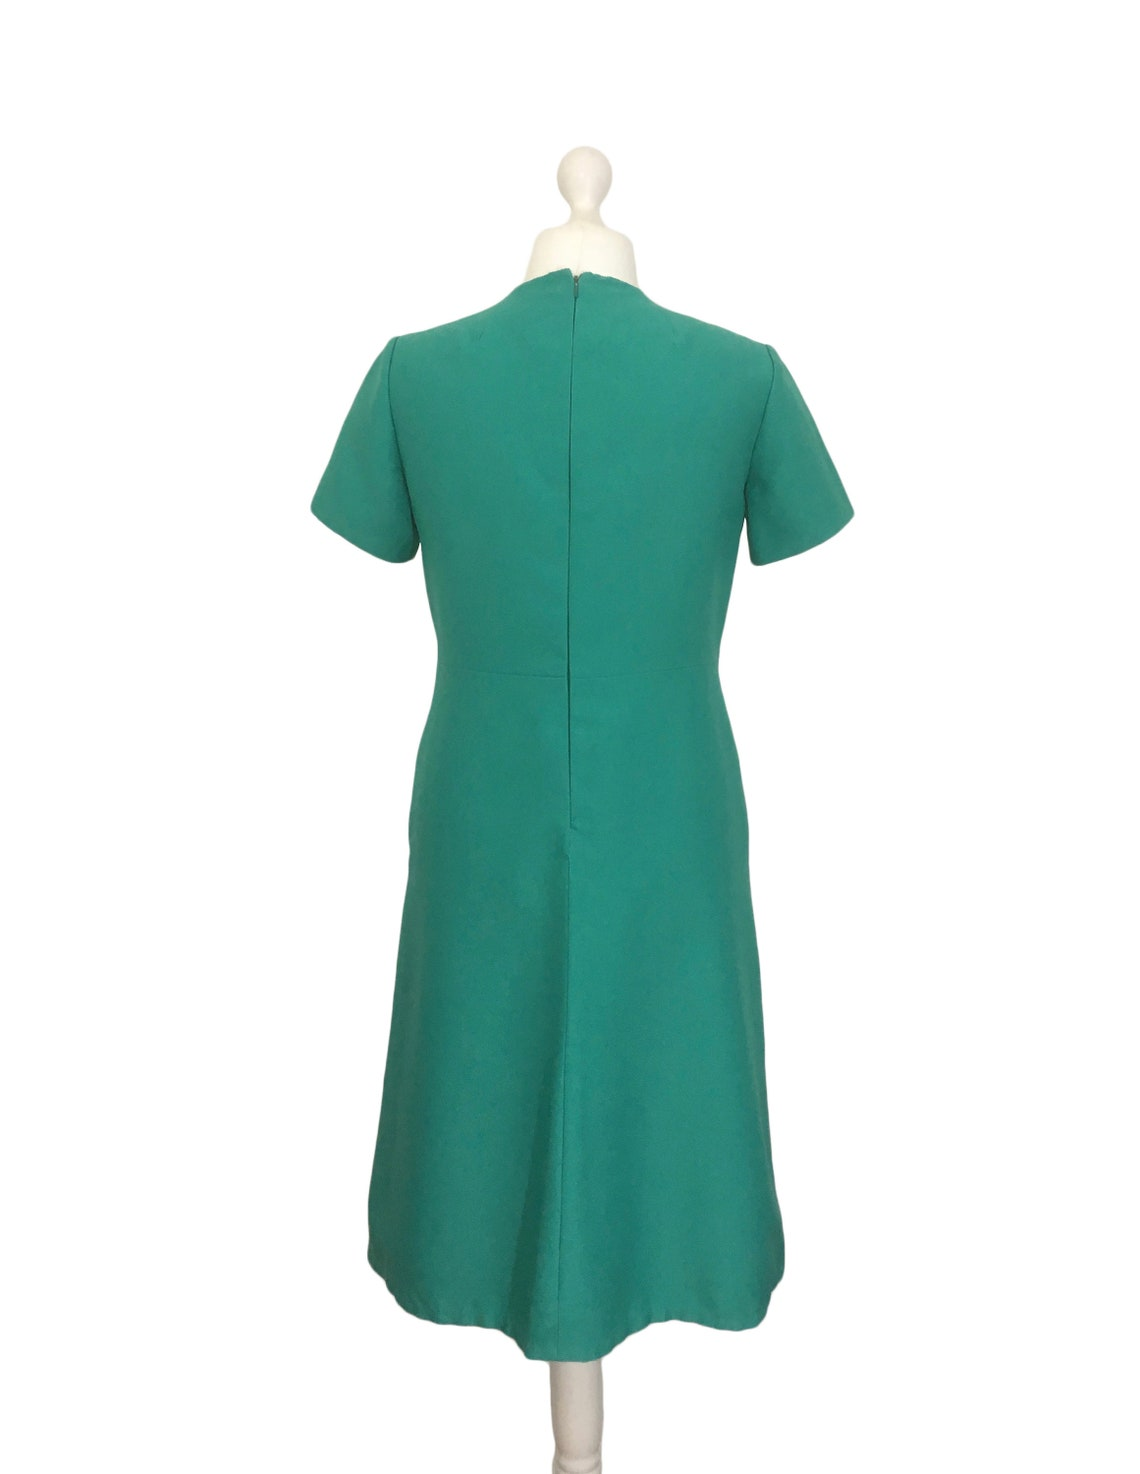 1960's Dress Size 16 Sea Green Vintage Day Dress